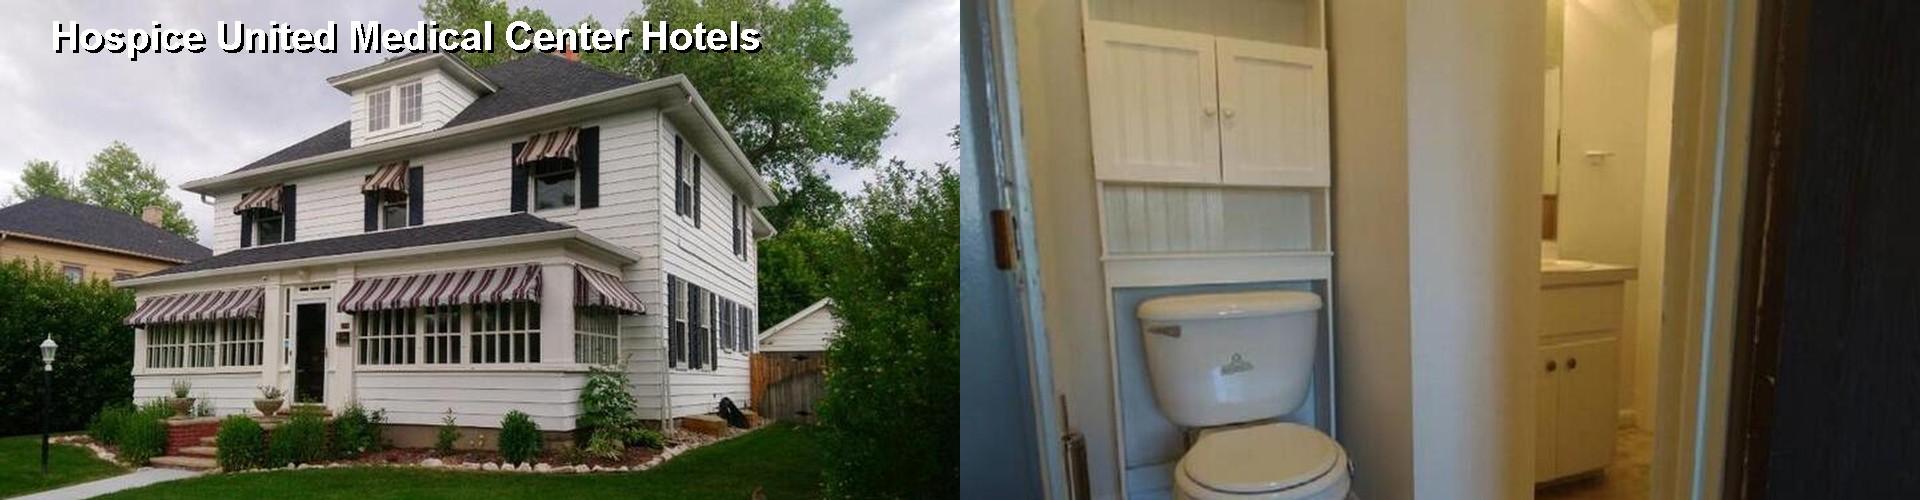 5 Best Hotels Near Hoe United Medical Center